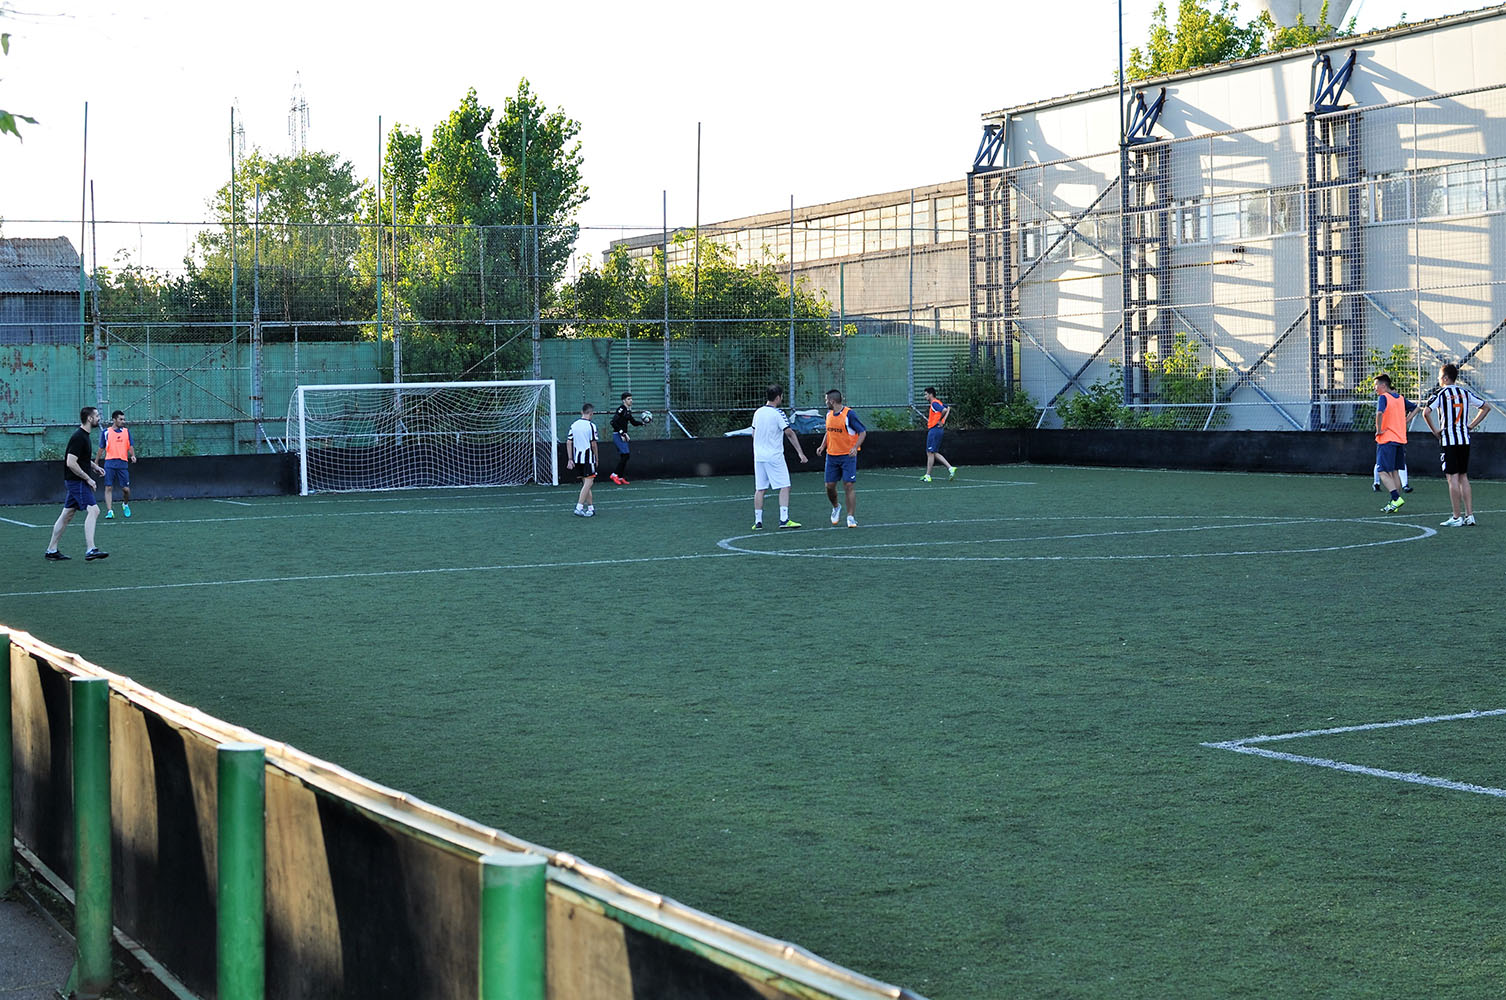 Baieti jucand fotbal pe un teren sintetic la Clubul Popeci din Craiova